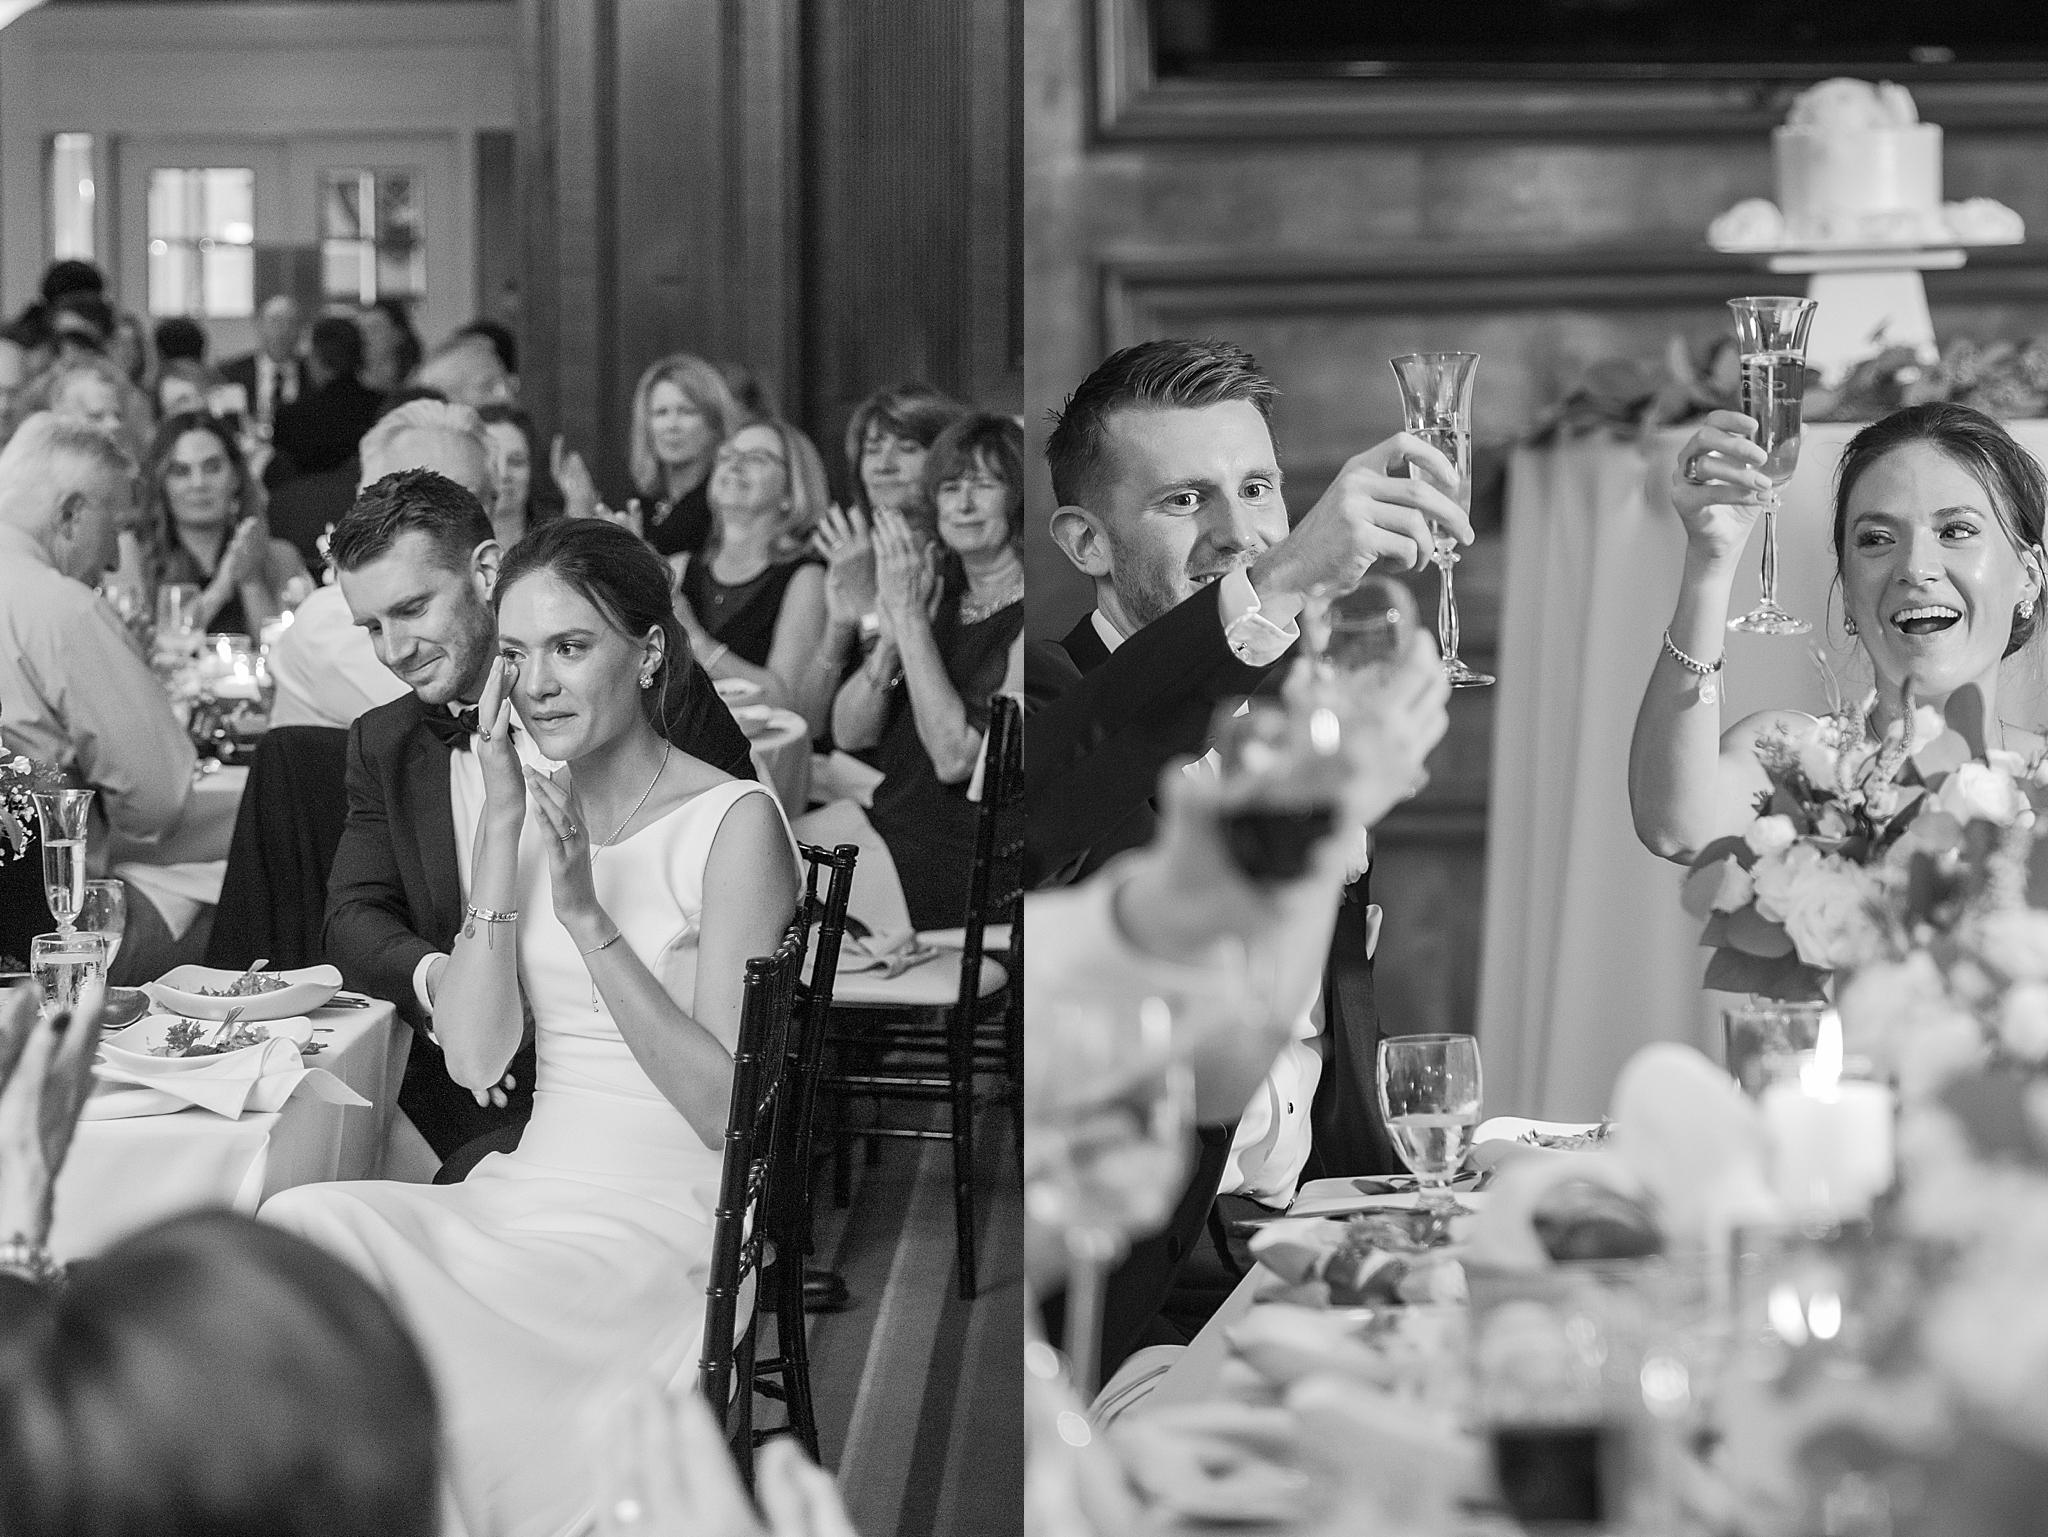 detroit-wedding-photographer-grosse-pointe-academy-chapel-detroit-golf-club-wedding-carly-matt-by-courtney-carolyn-photography_0100.jpg